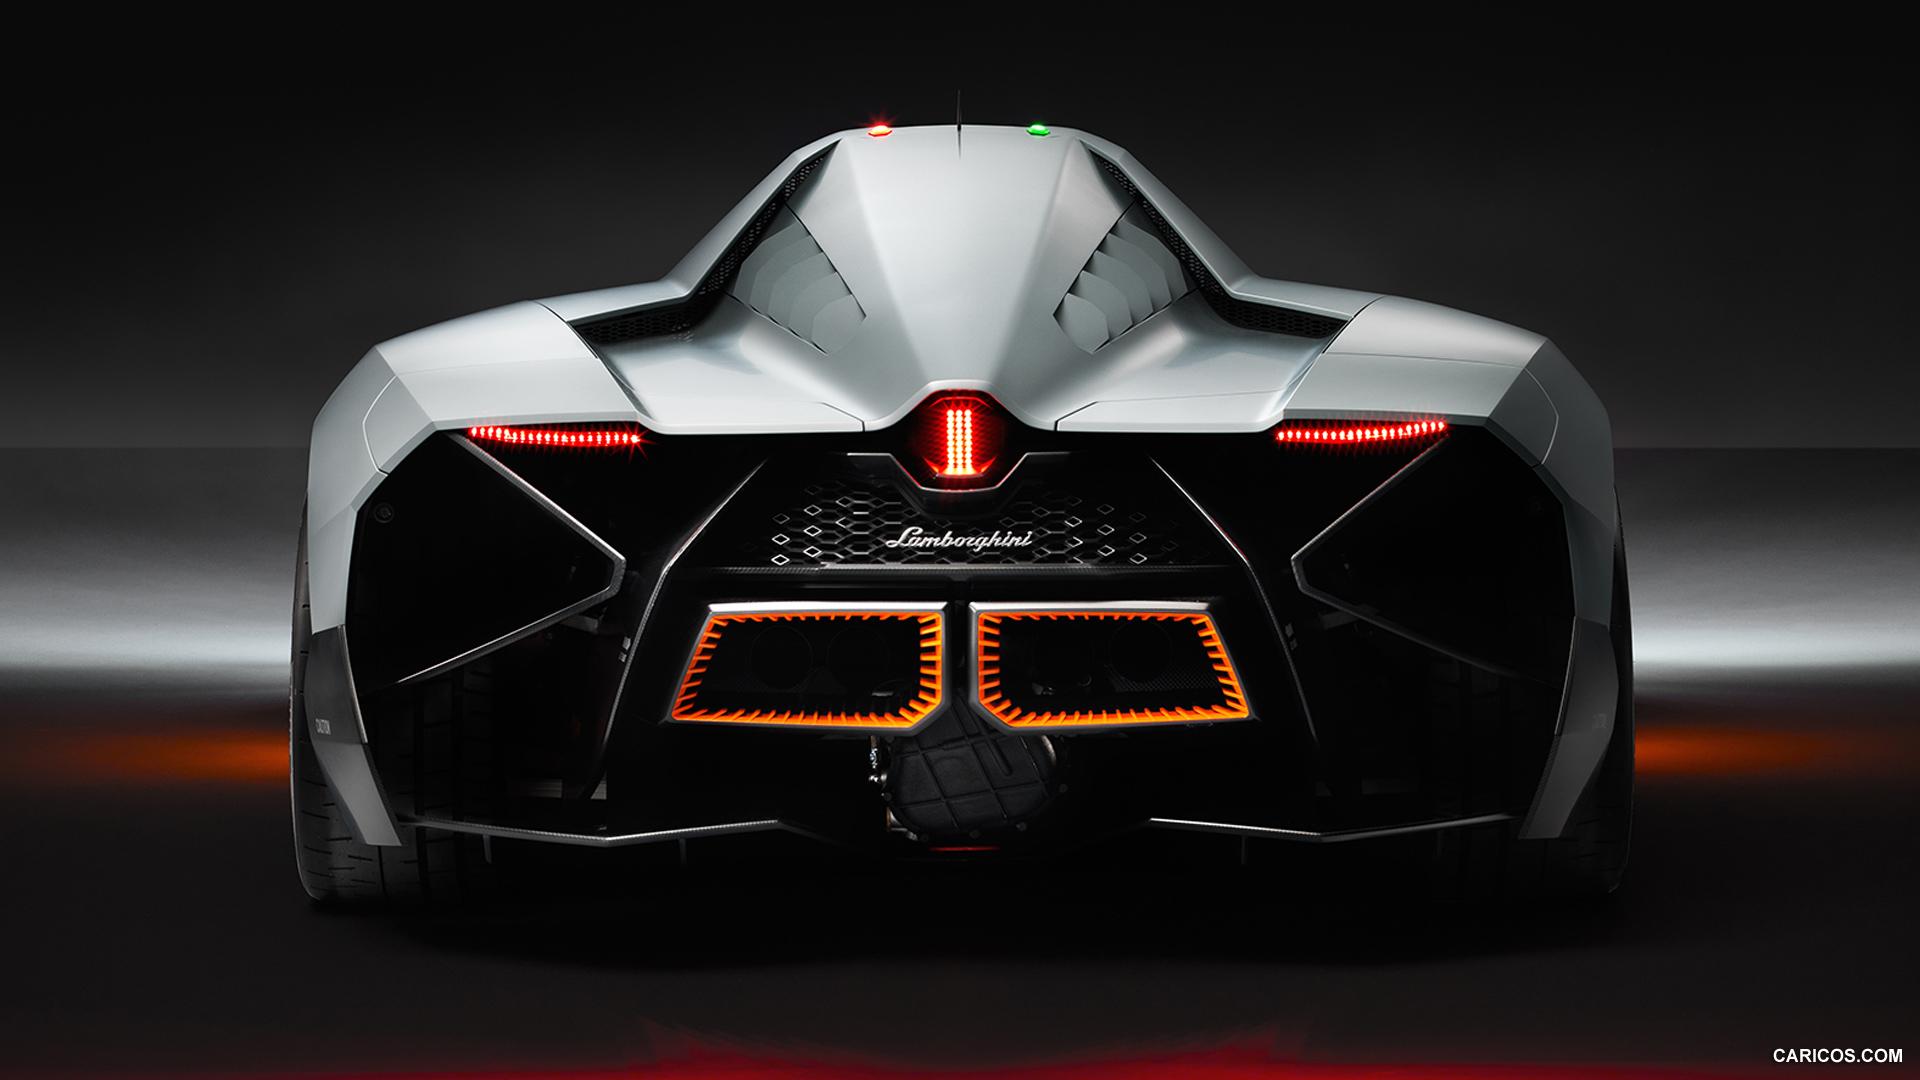 Lamborghini Veneno Wallpaper Downloadwallpaper Org